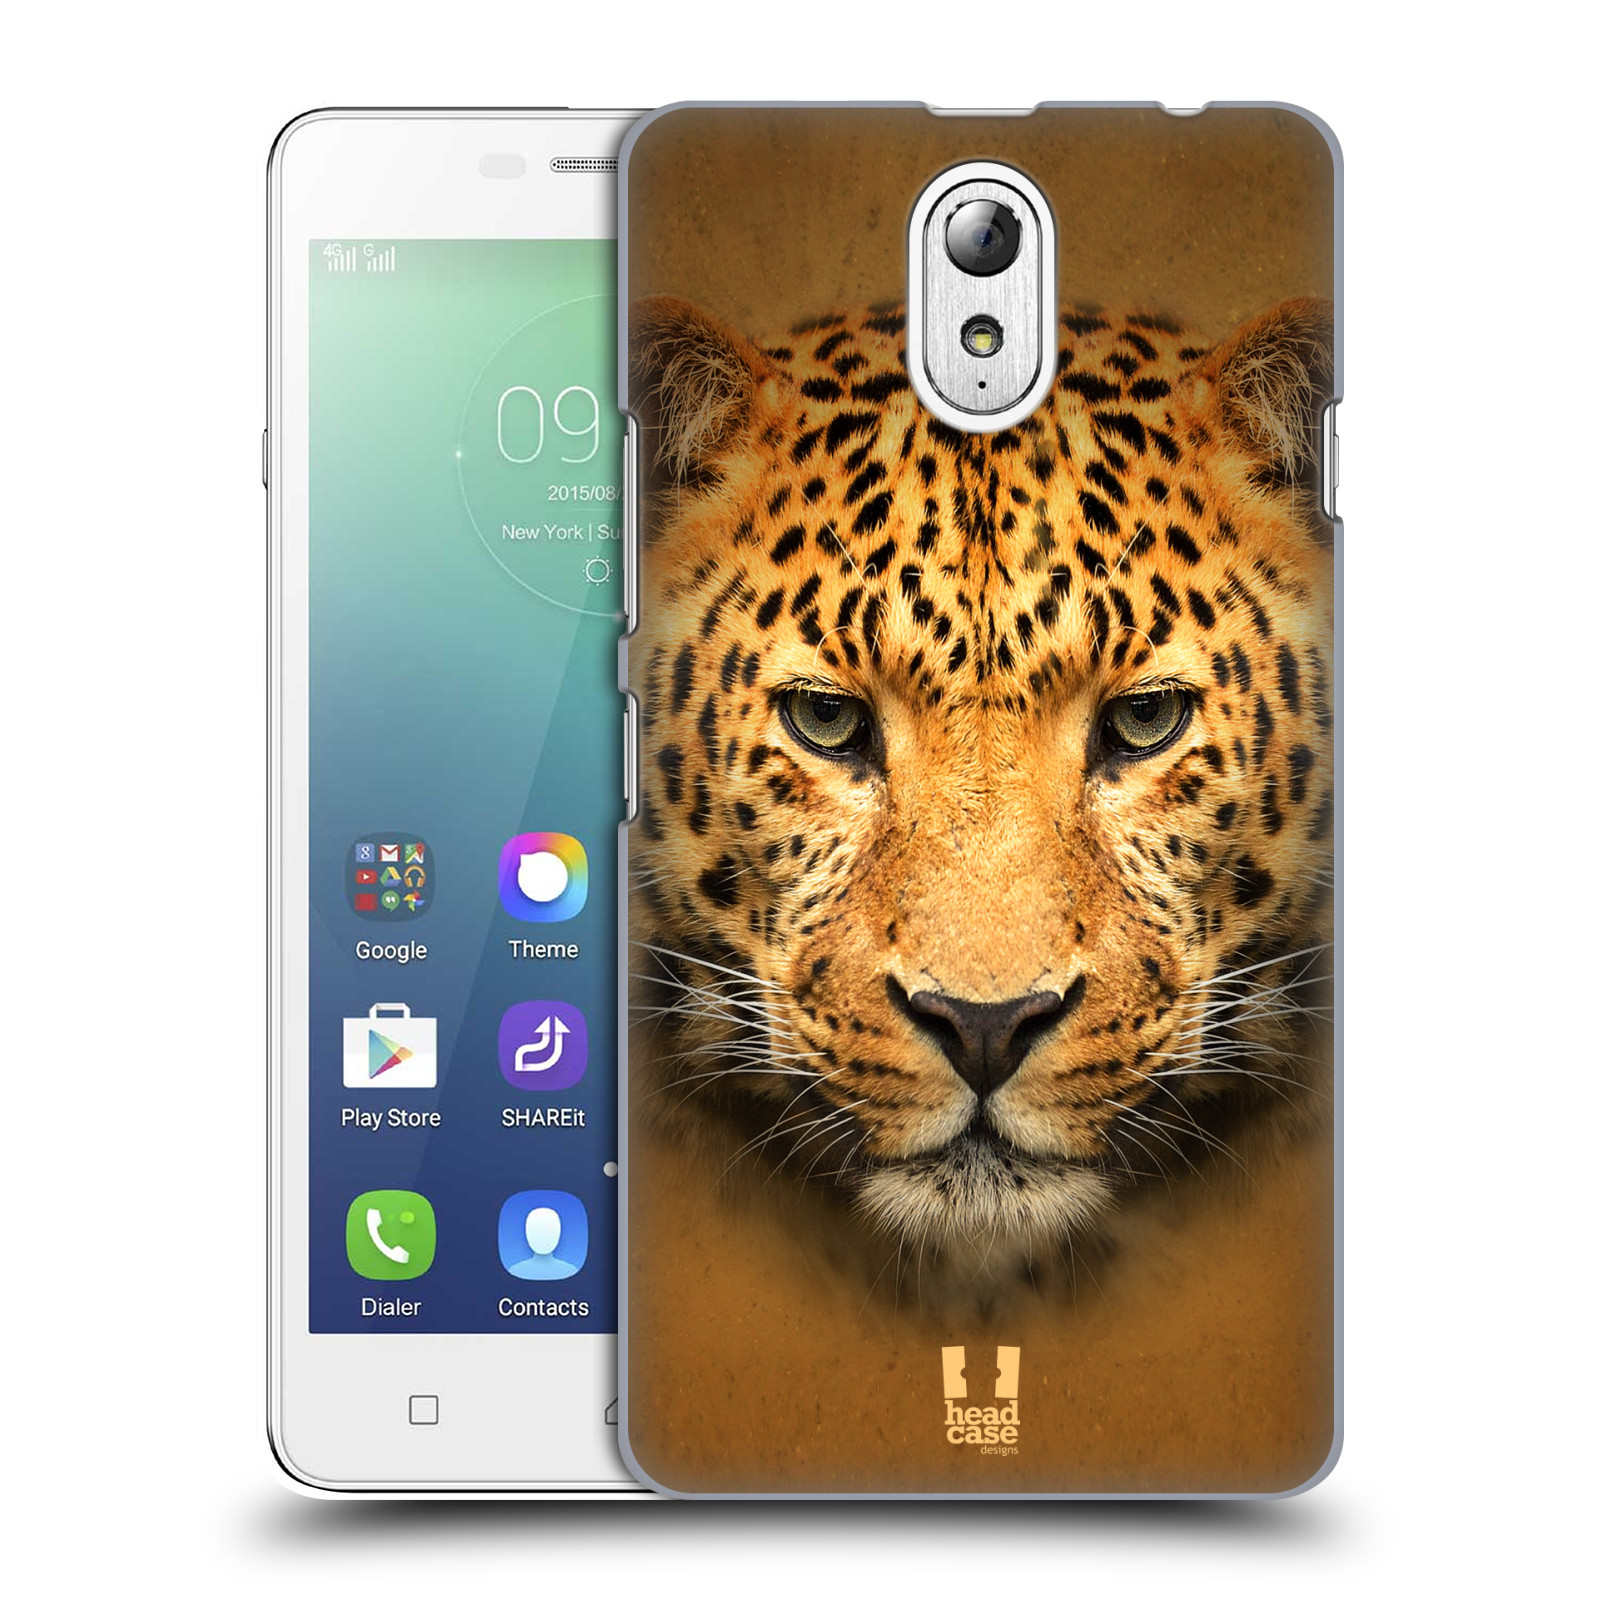 HEAD CASE pevný plastový obal na mobil LENOVO VIBE P1m / LENOVO VIBE p1m DUAL SIM vzor Zvířecí tváře 2 leopard